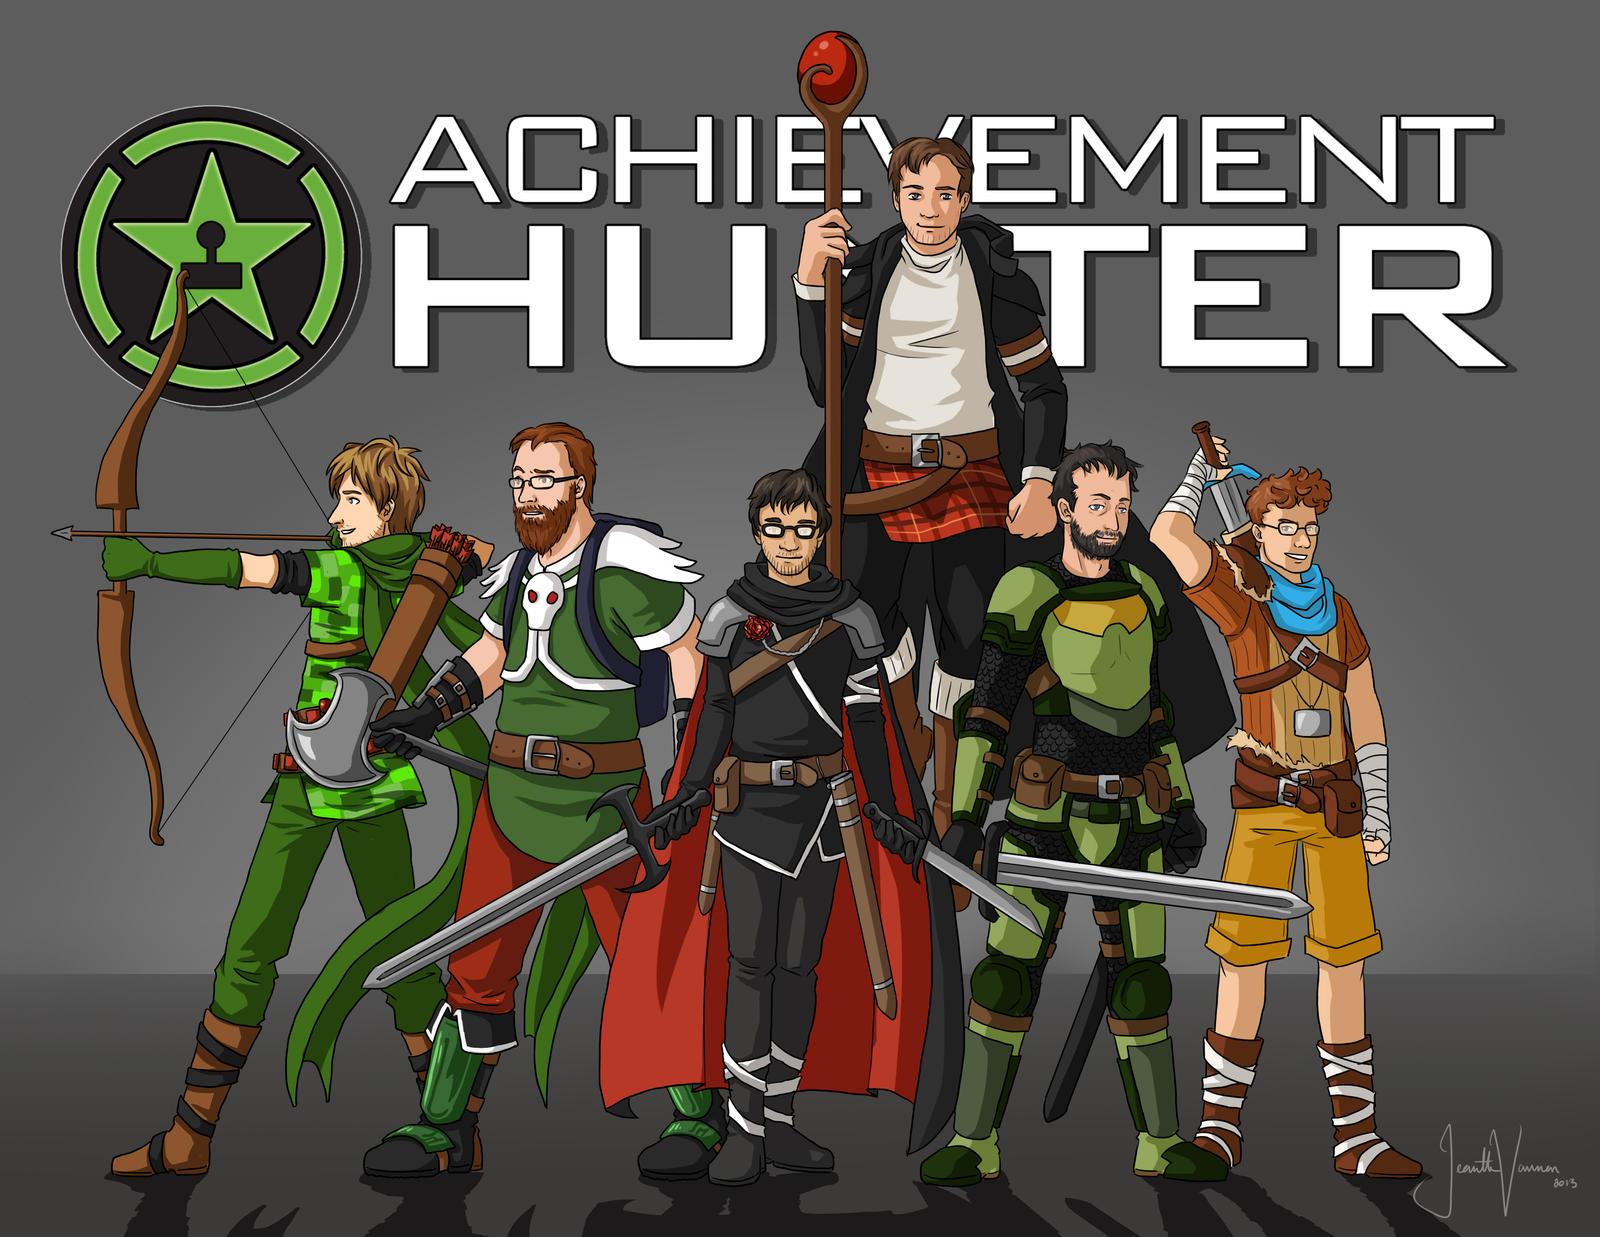 Achievement Hunter Kings